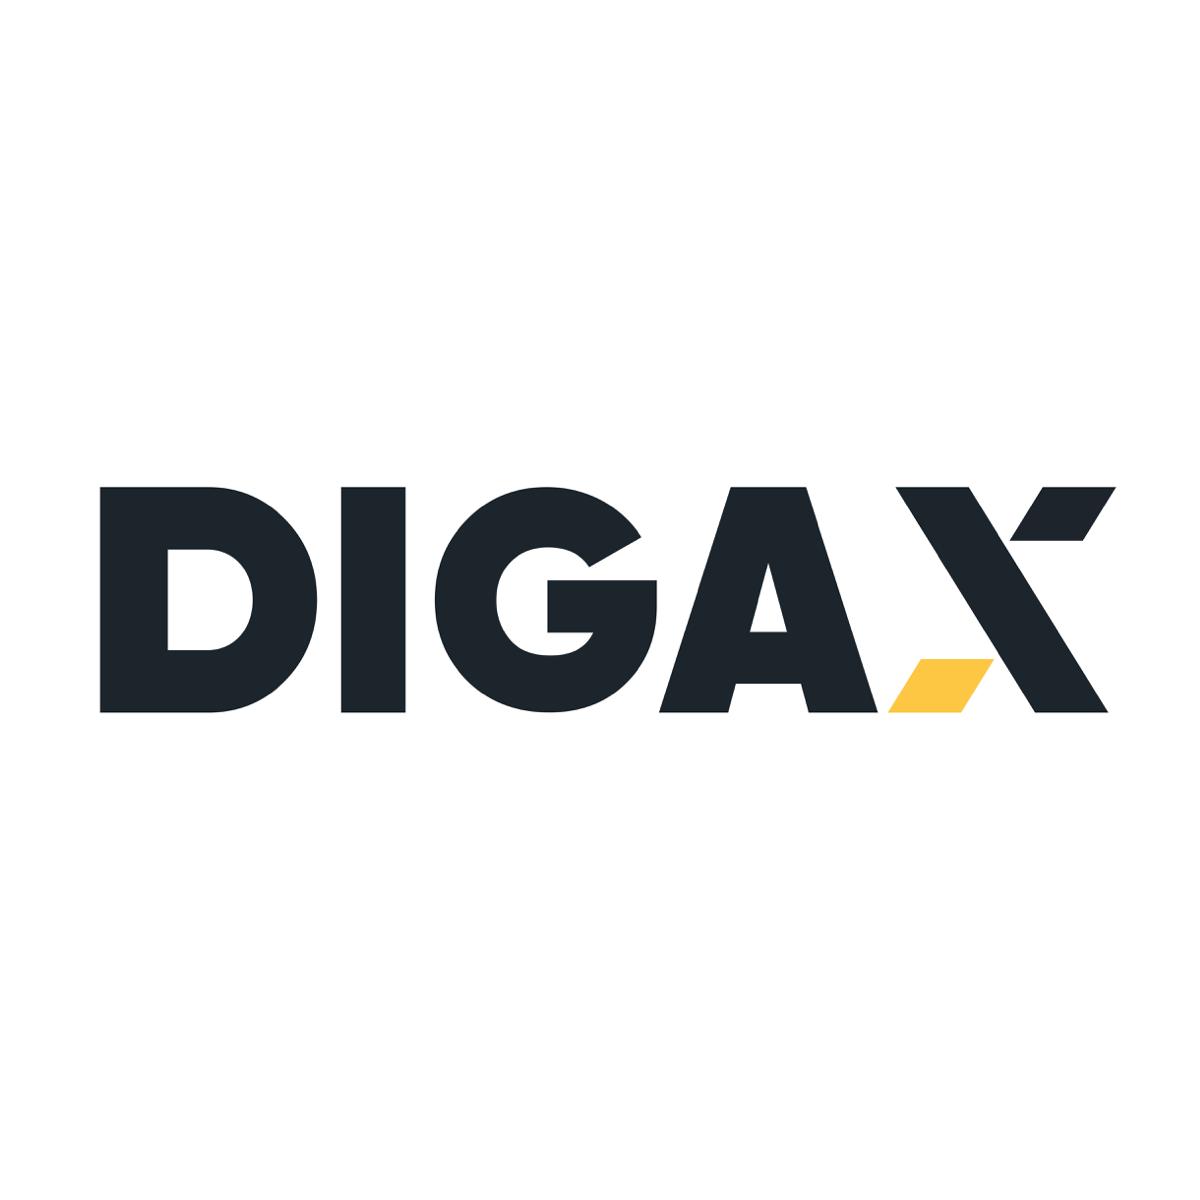 Digax logo